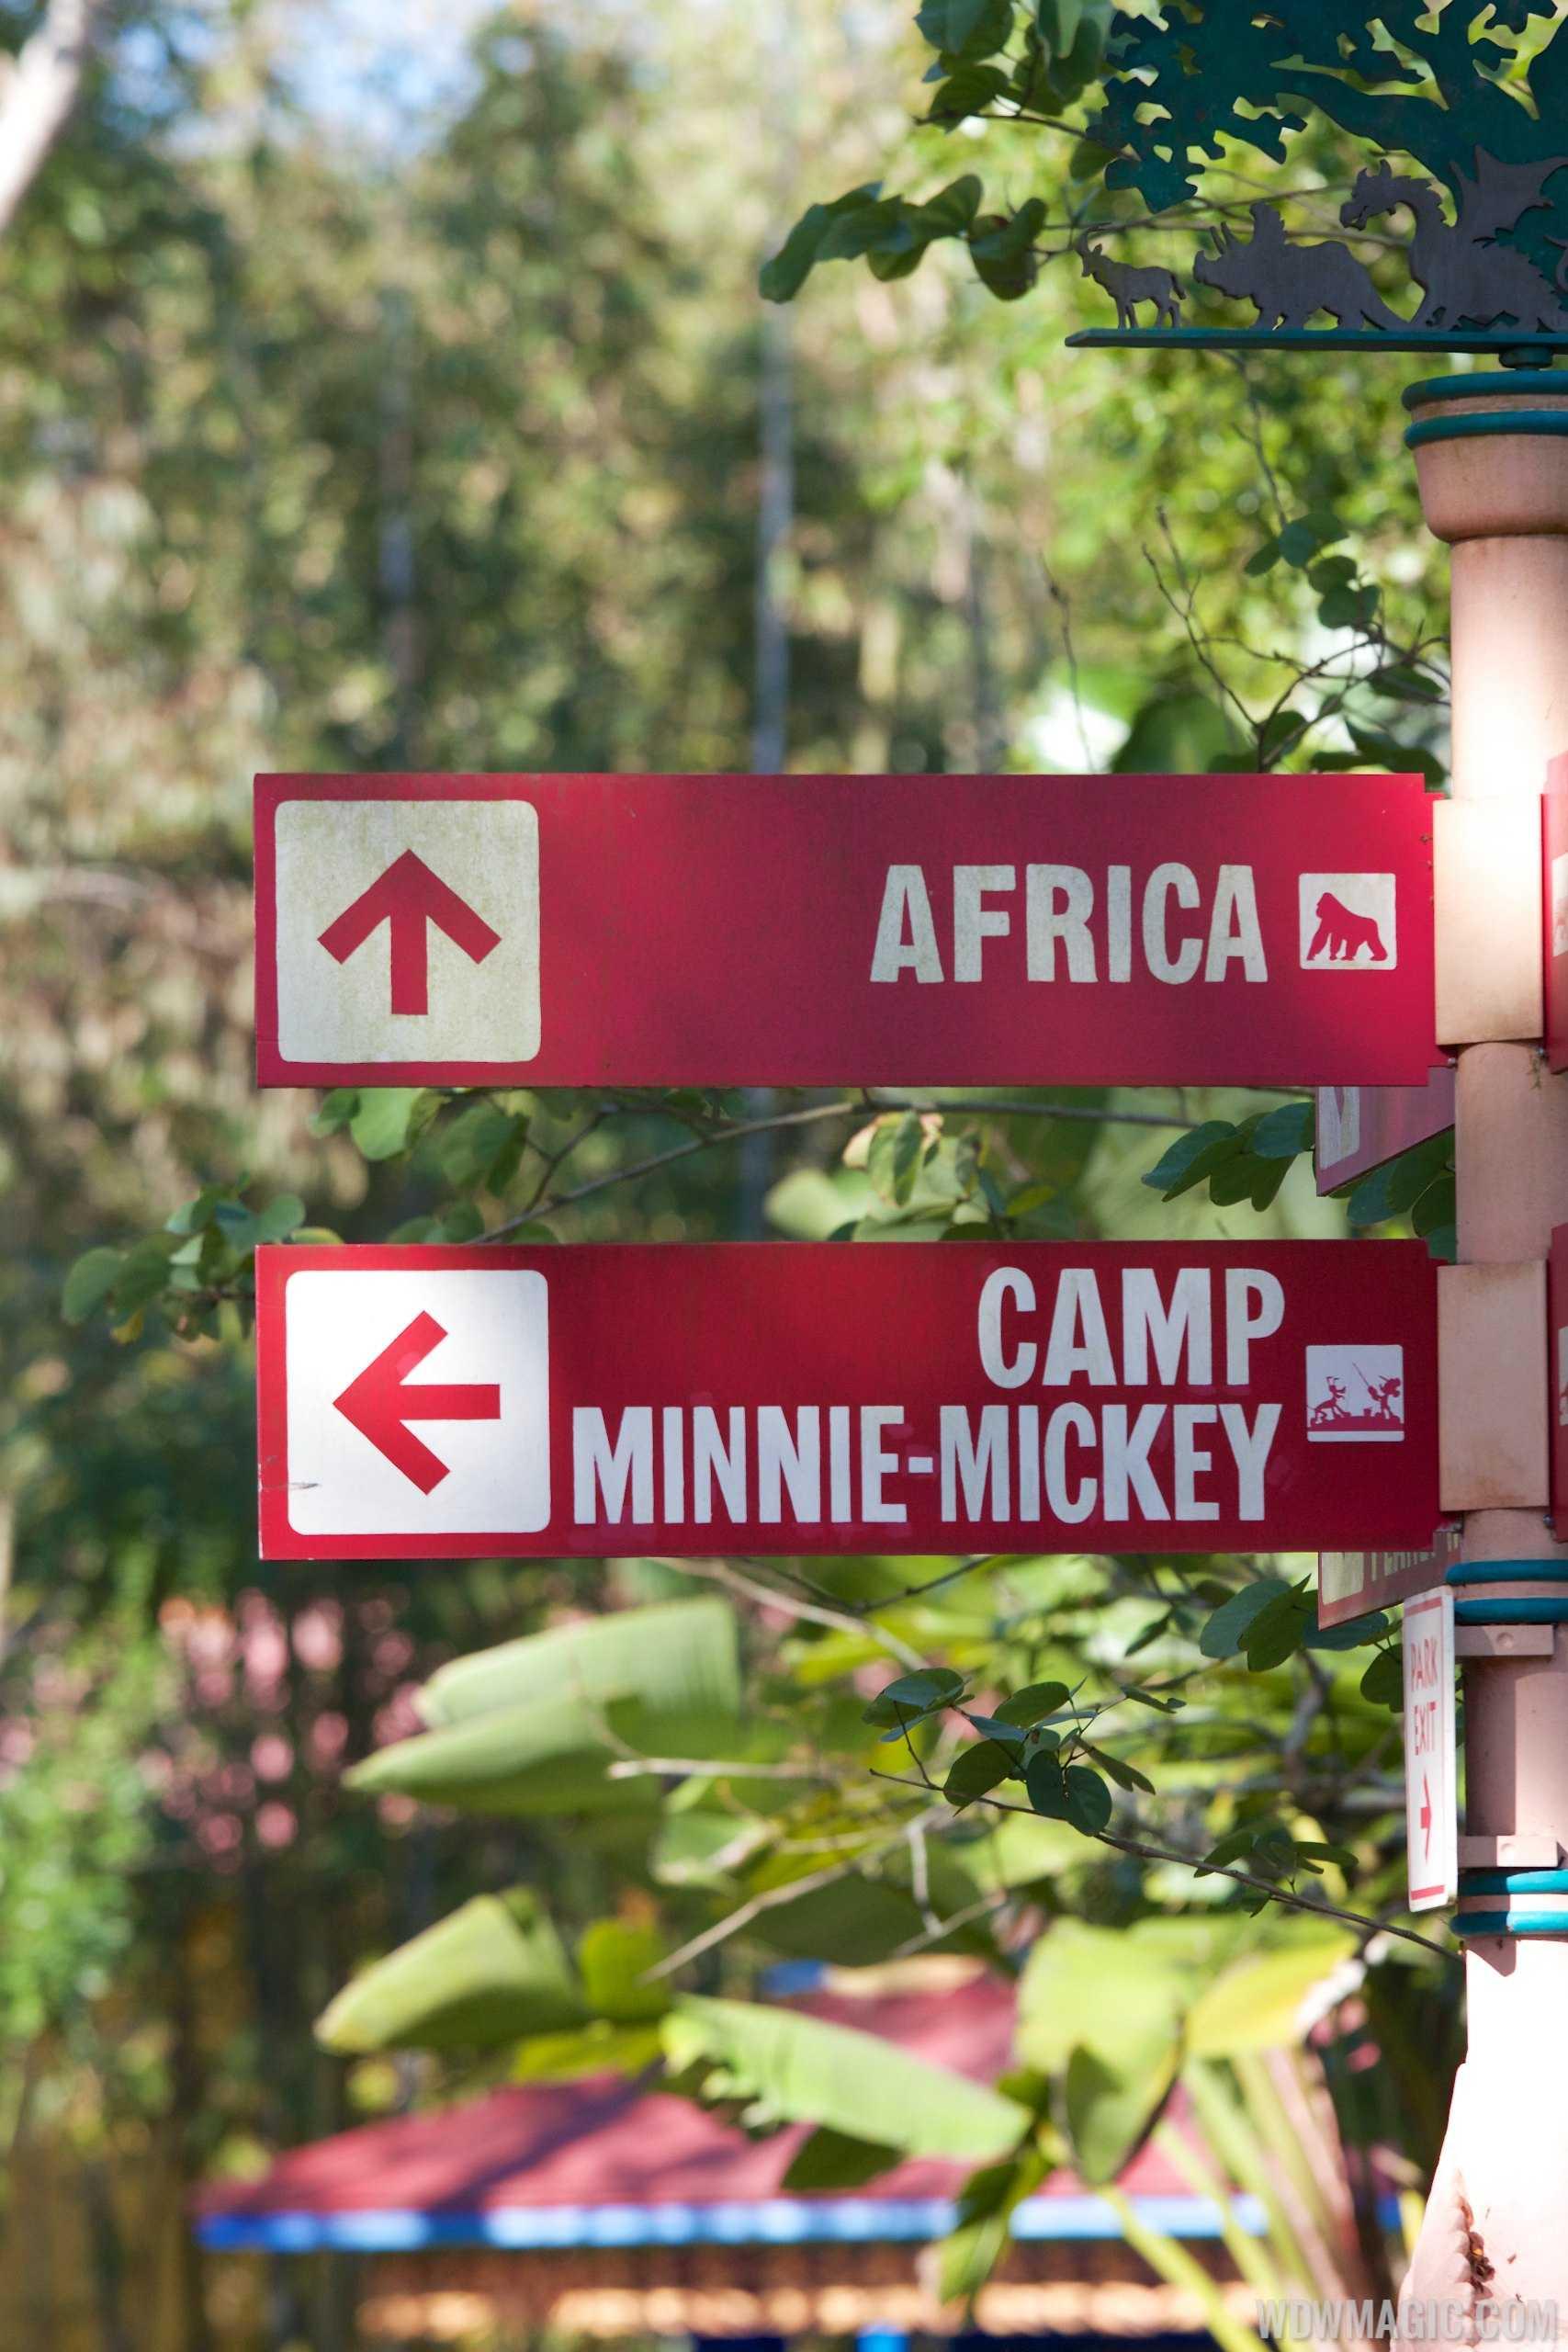 Camp Minnie-Mickey - Signage